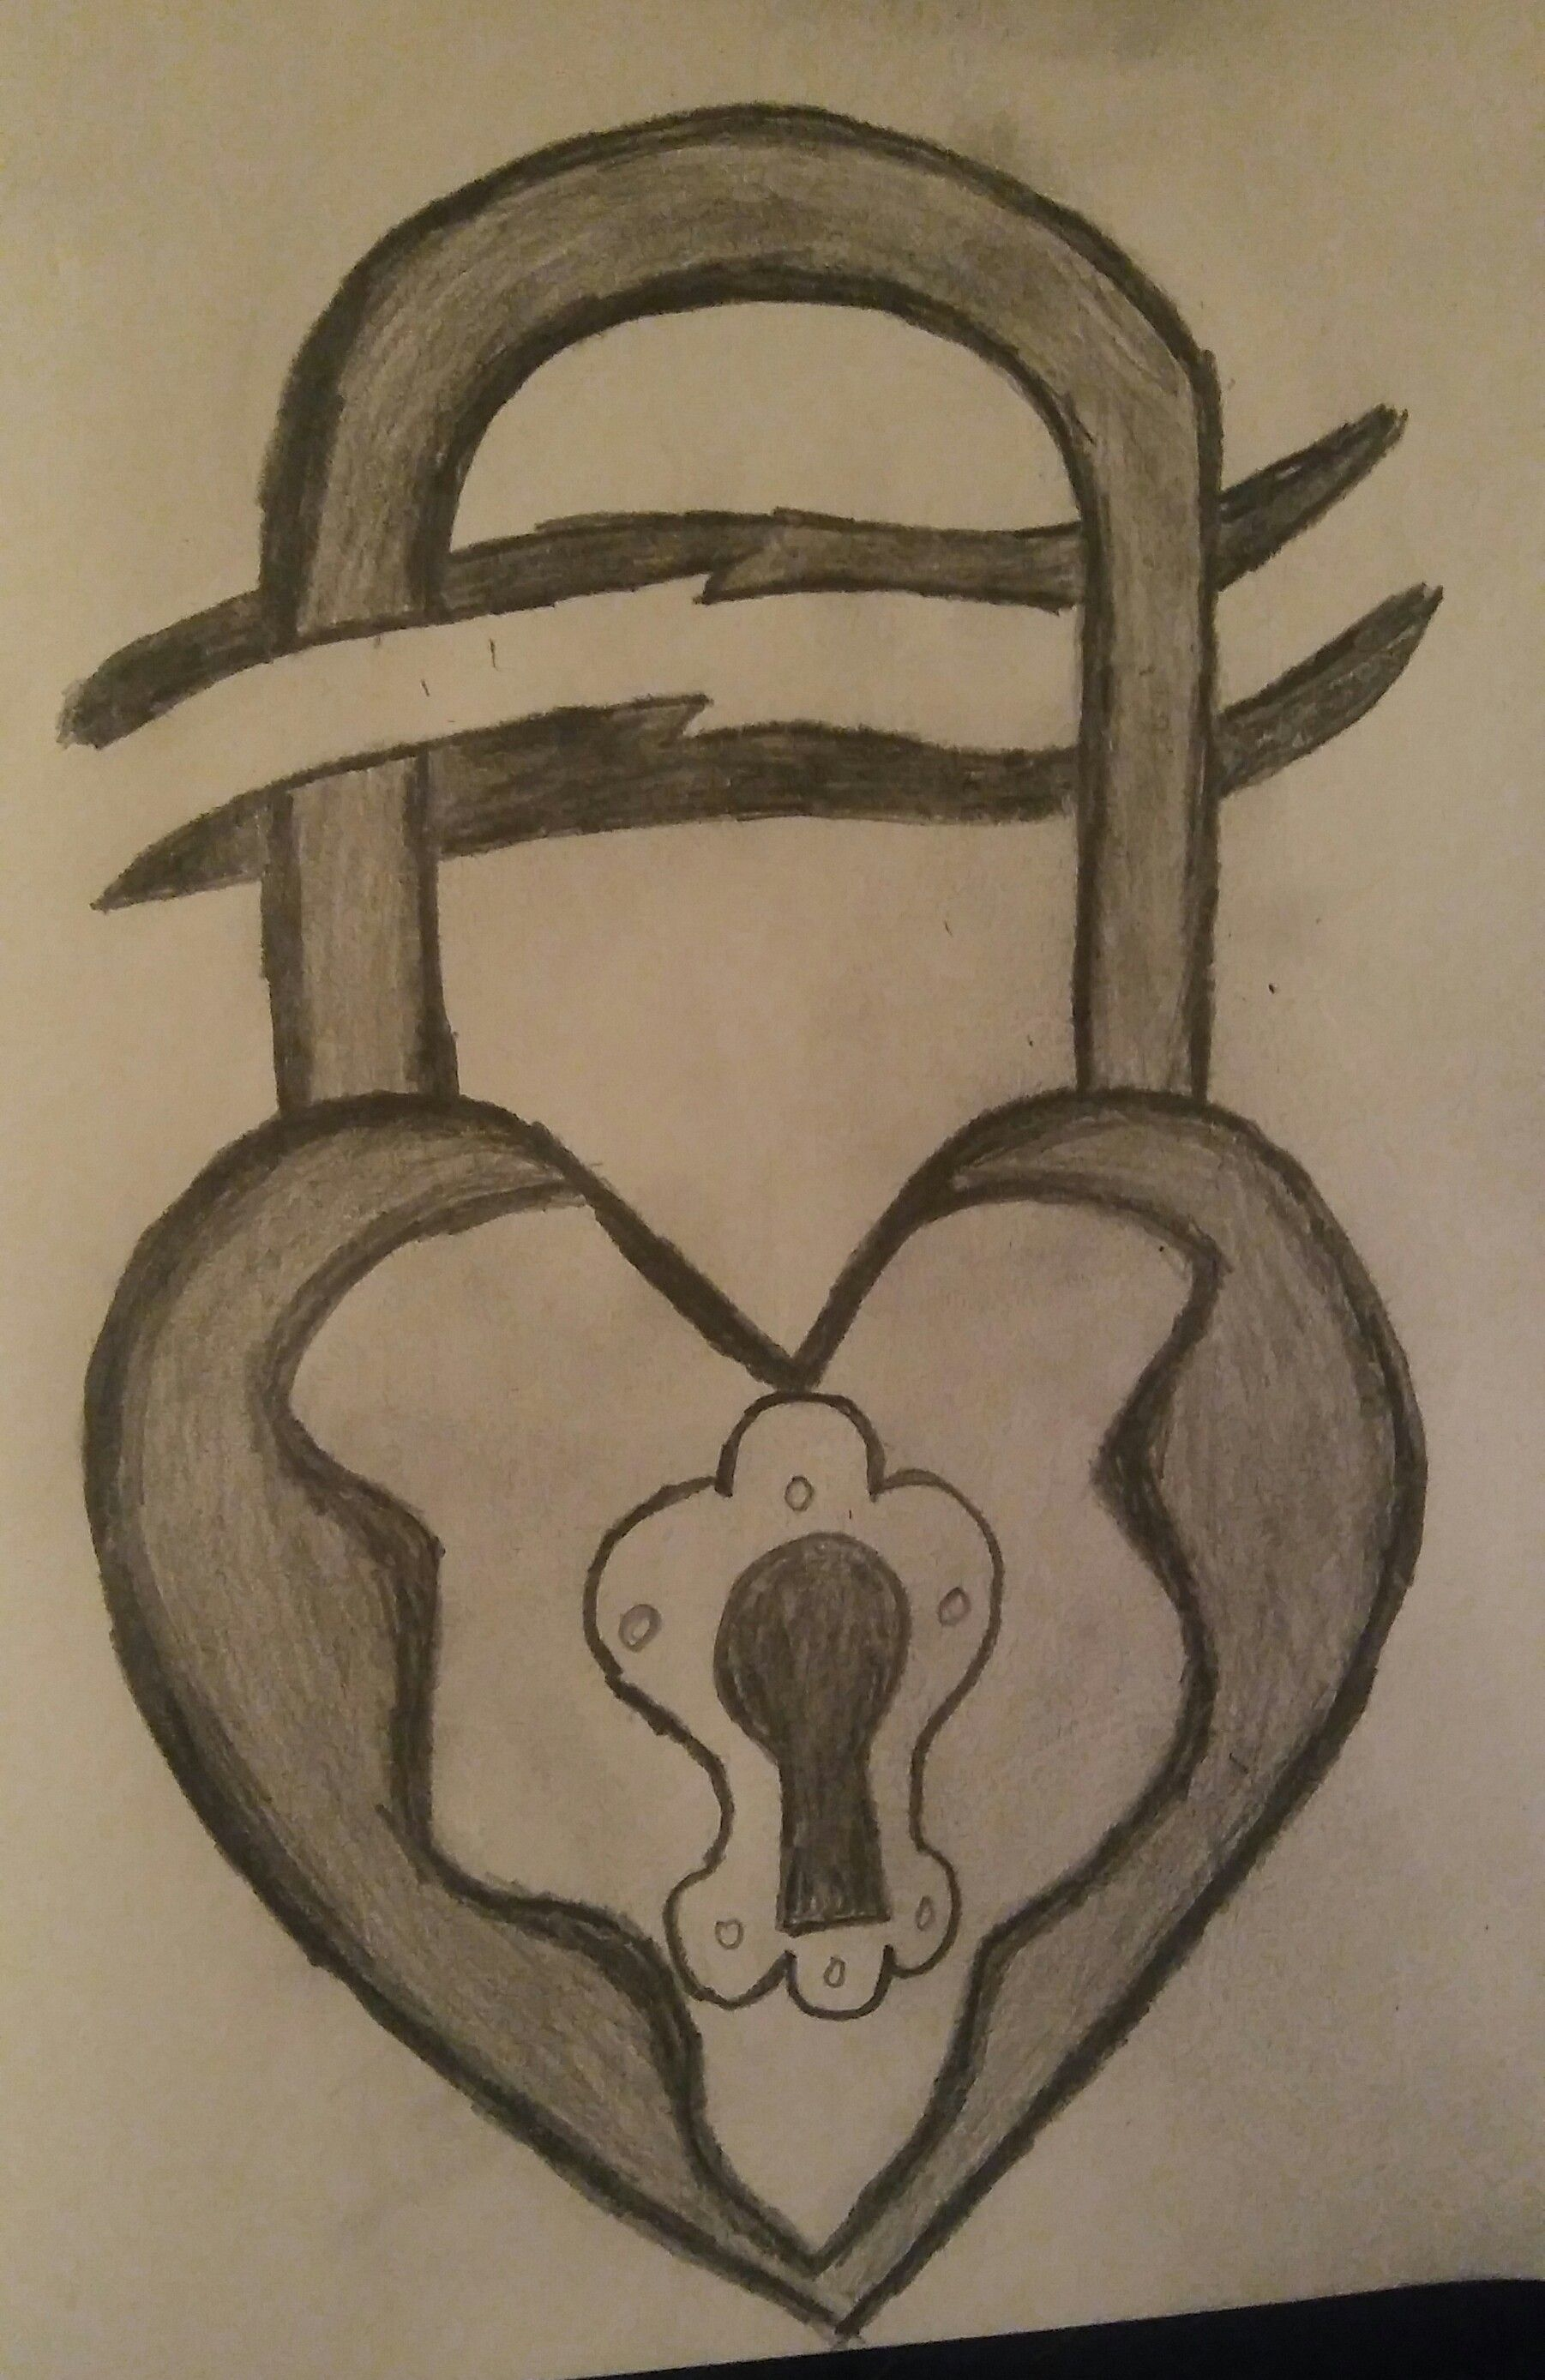 1802x2775 Heart Lock Drawing Do Not Enter Steemit